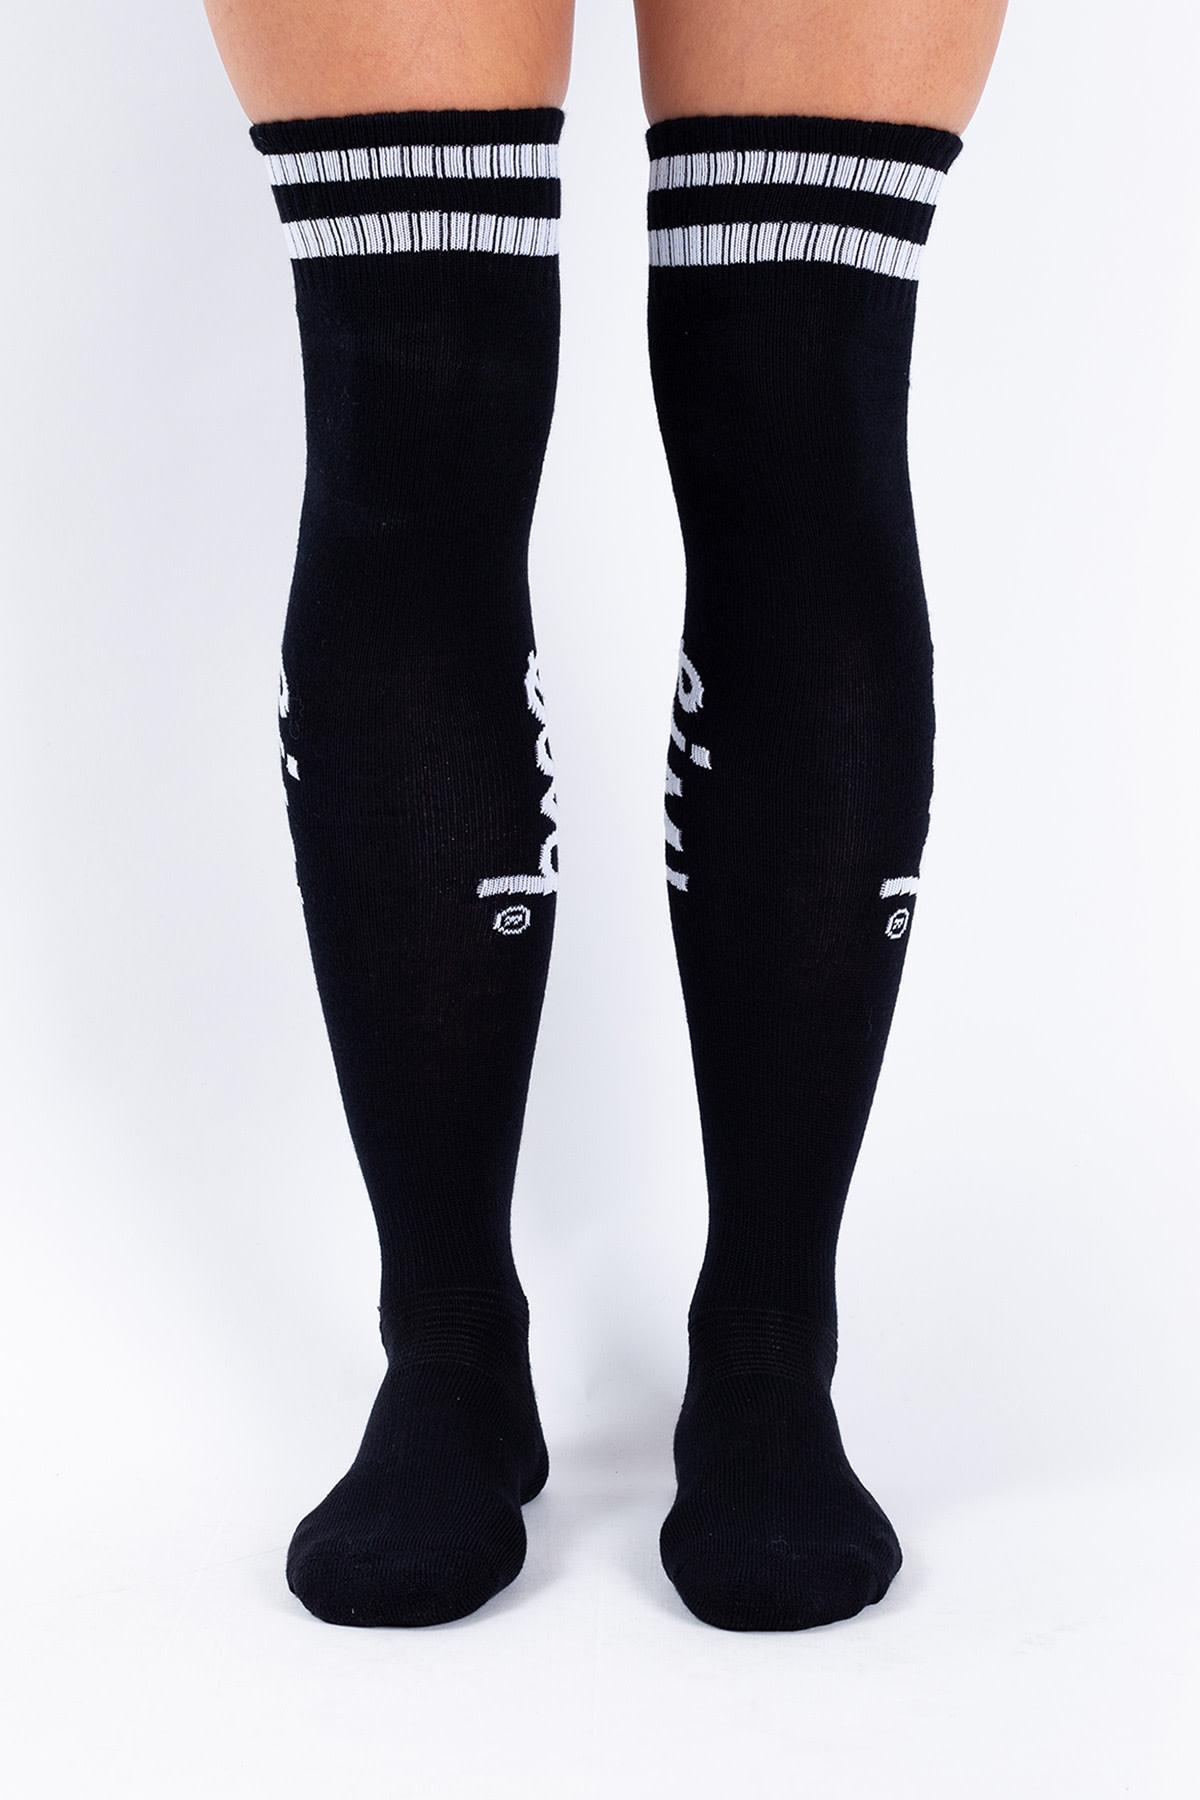 Eivy Eivy Women's Cheerleader Wool Over Knee Sock